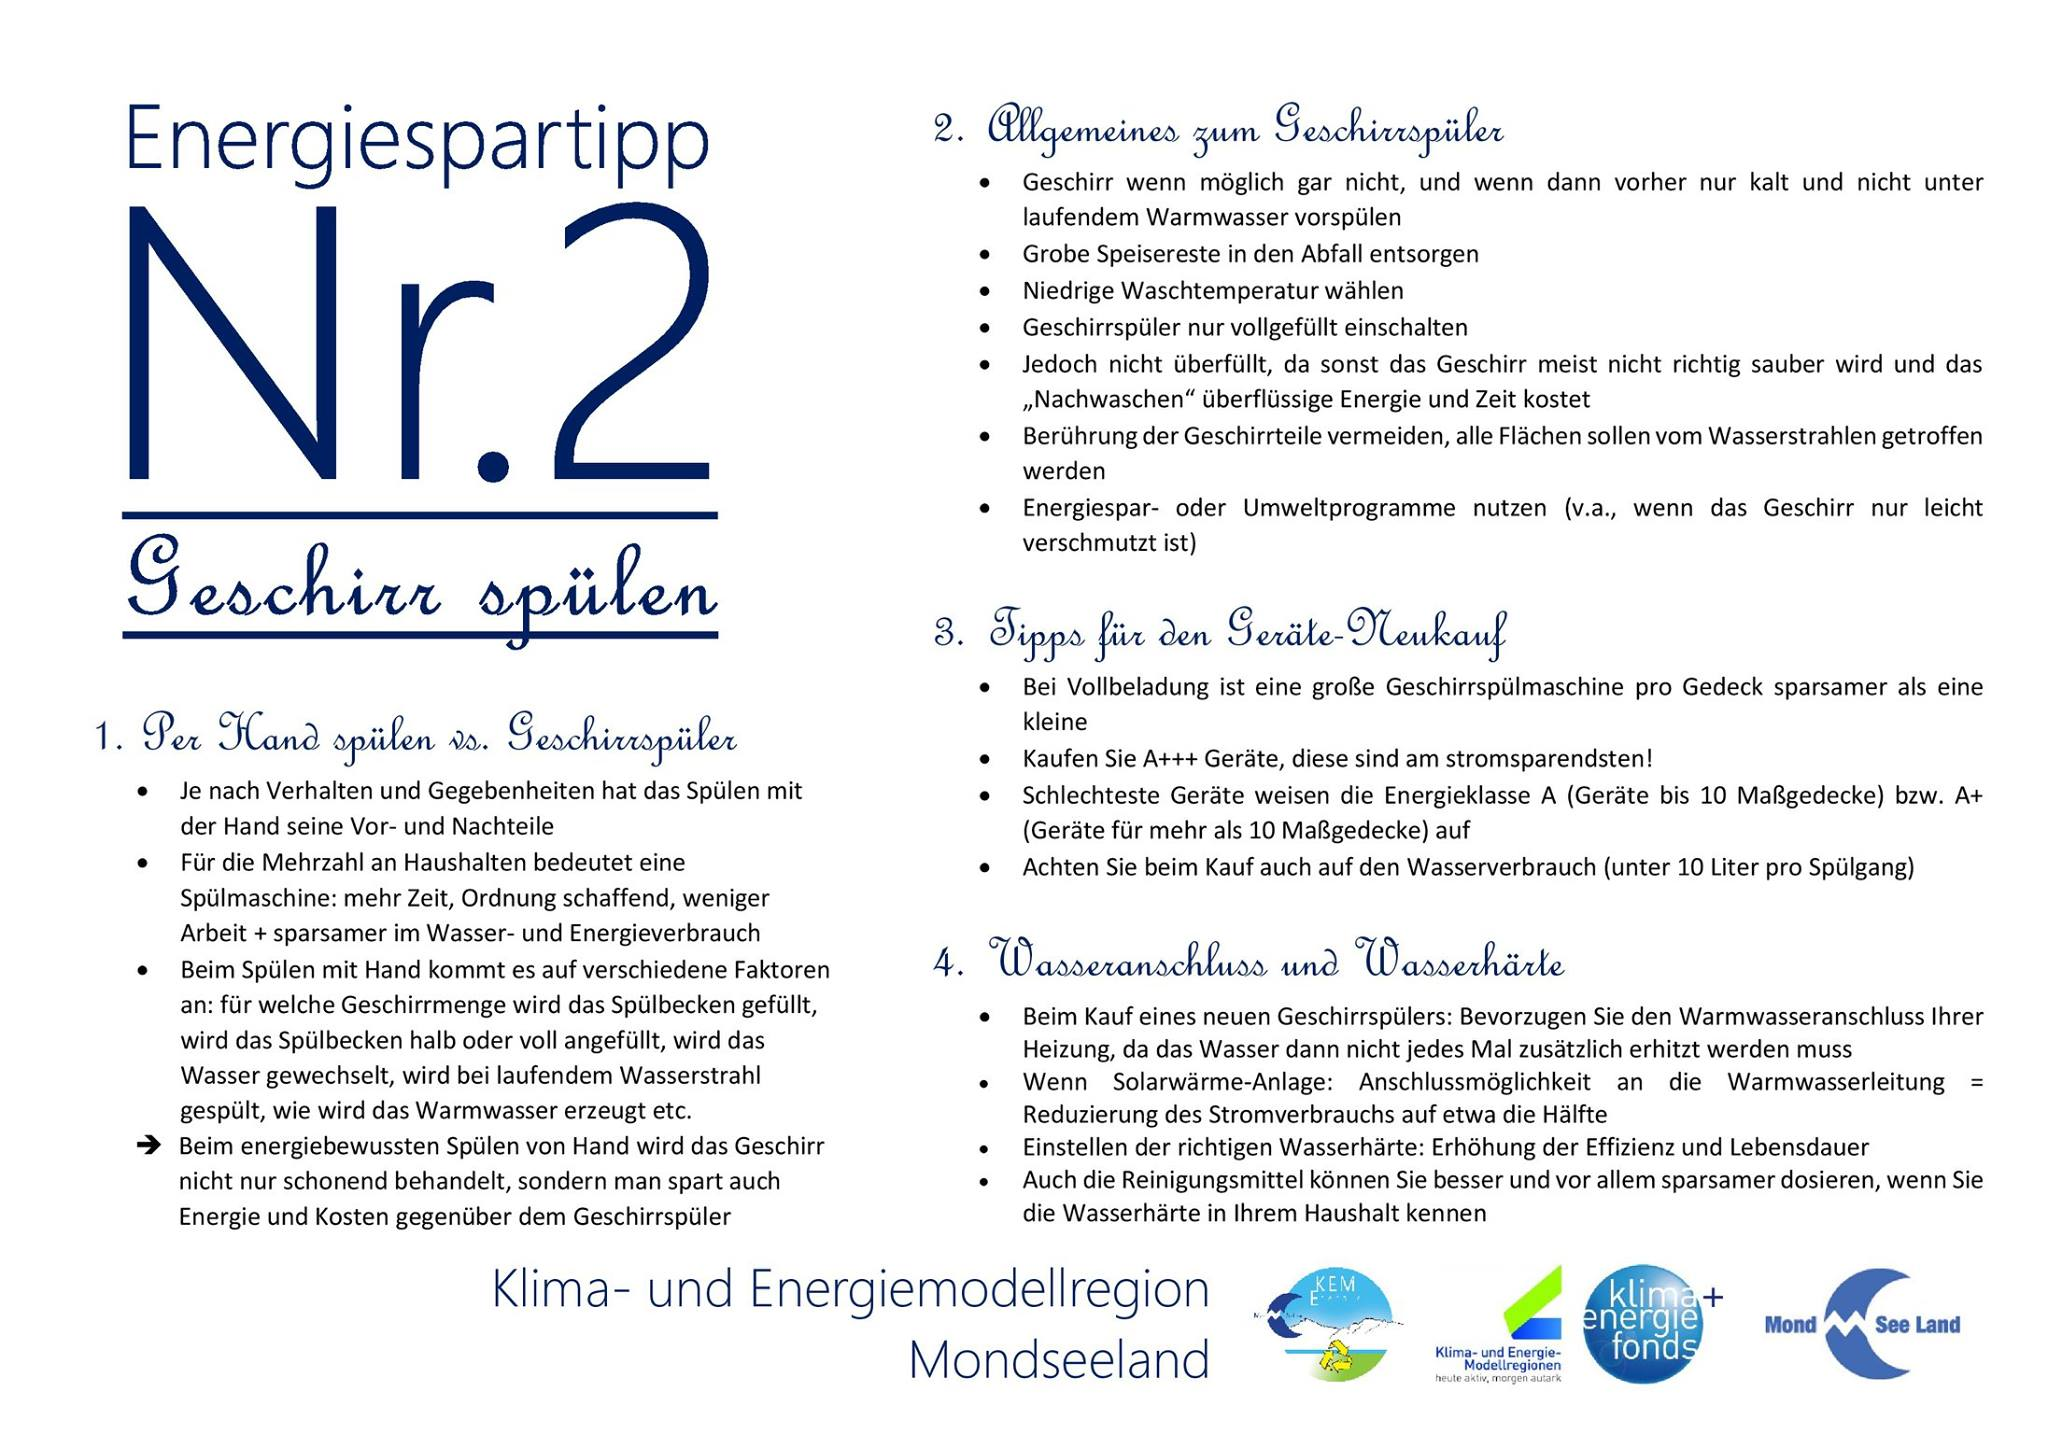 energiespartipp_Geschirr spülen_2